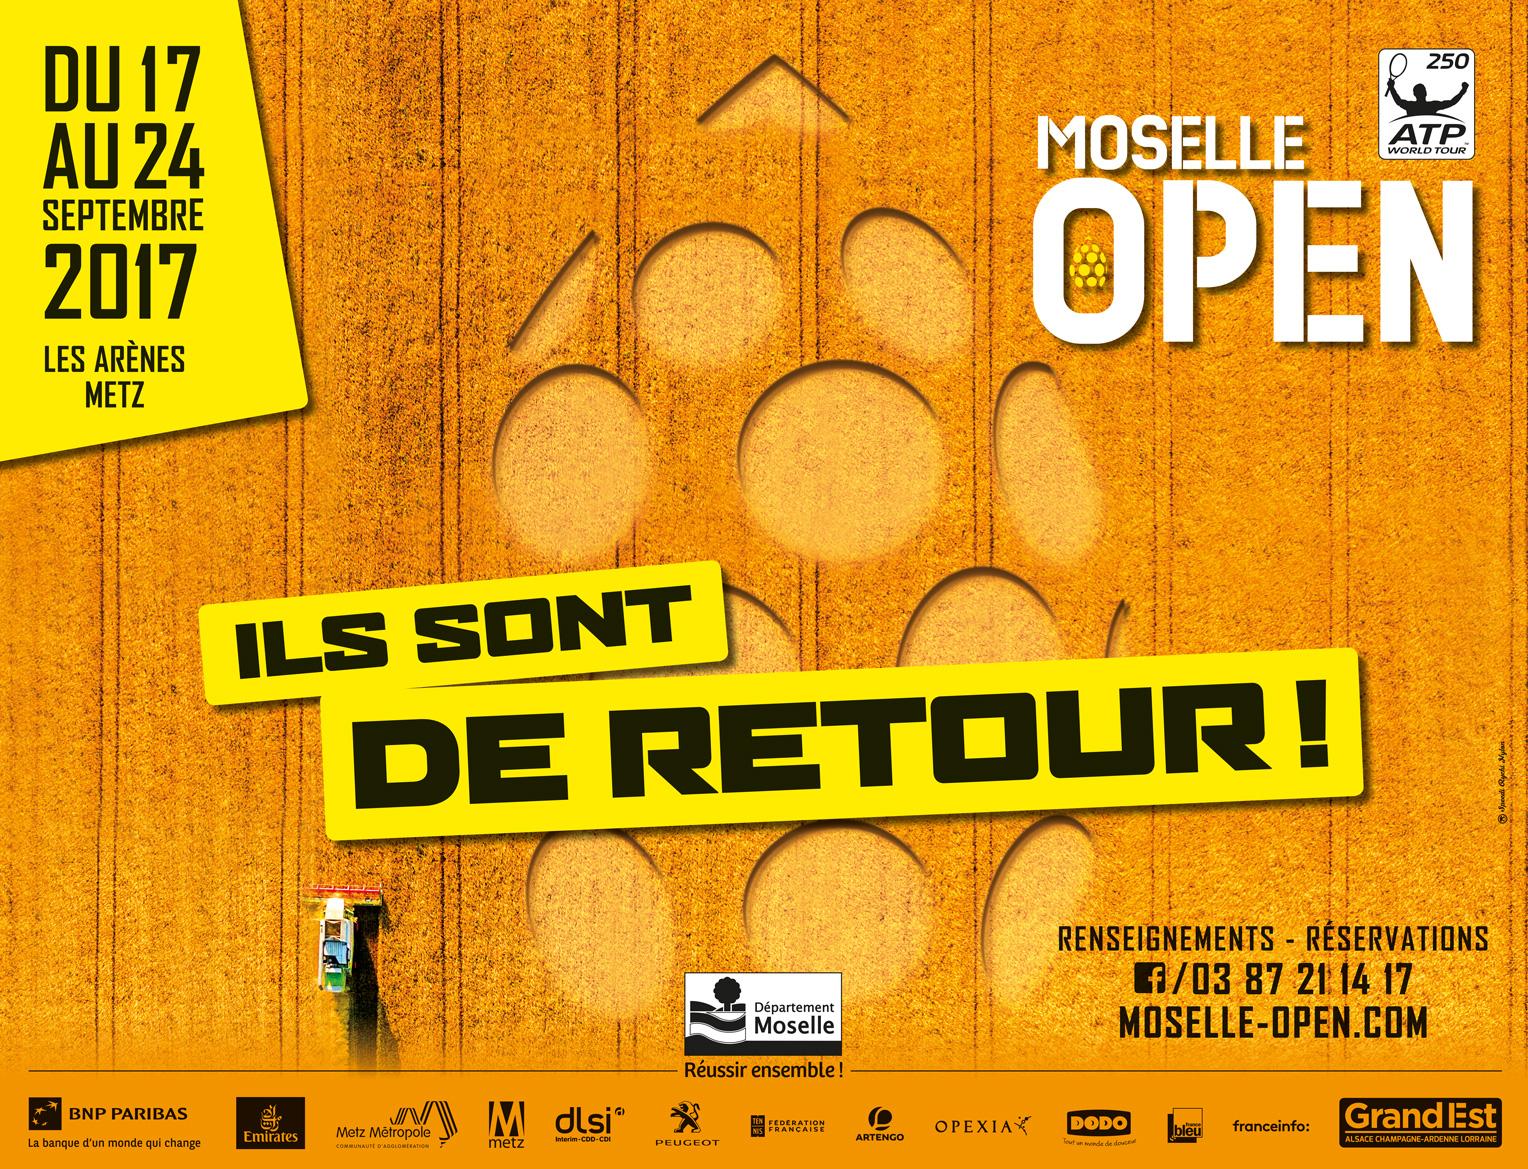 Moselle Open 2017